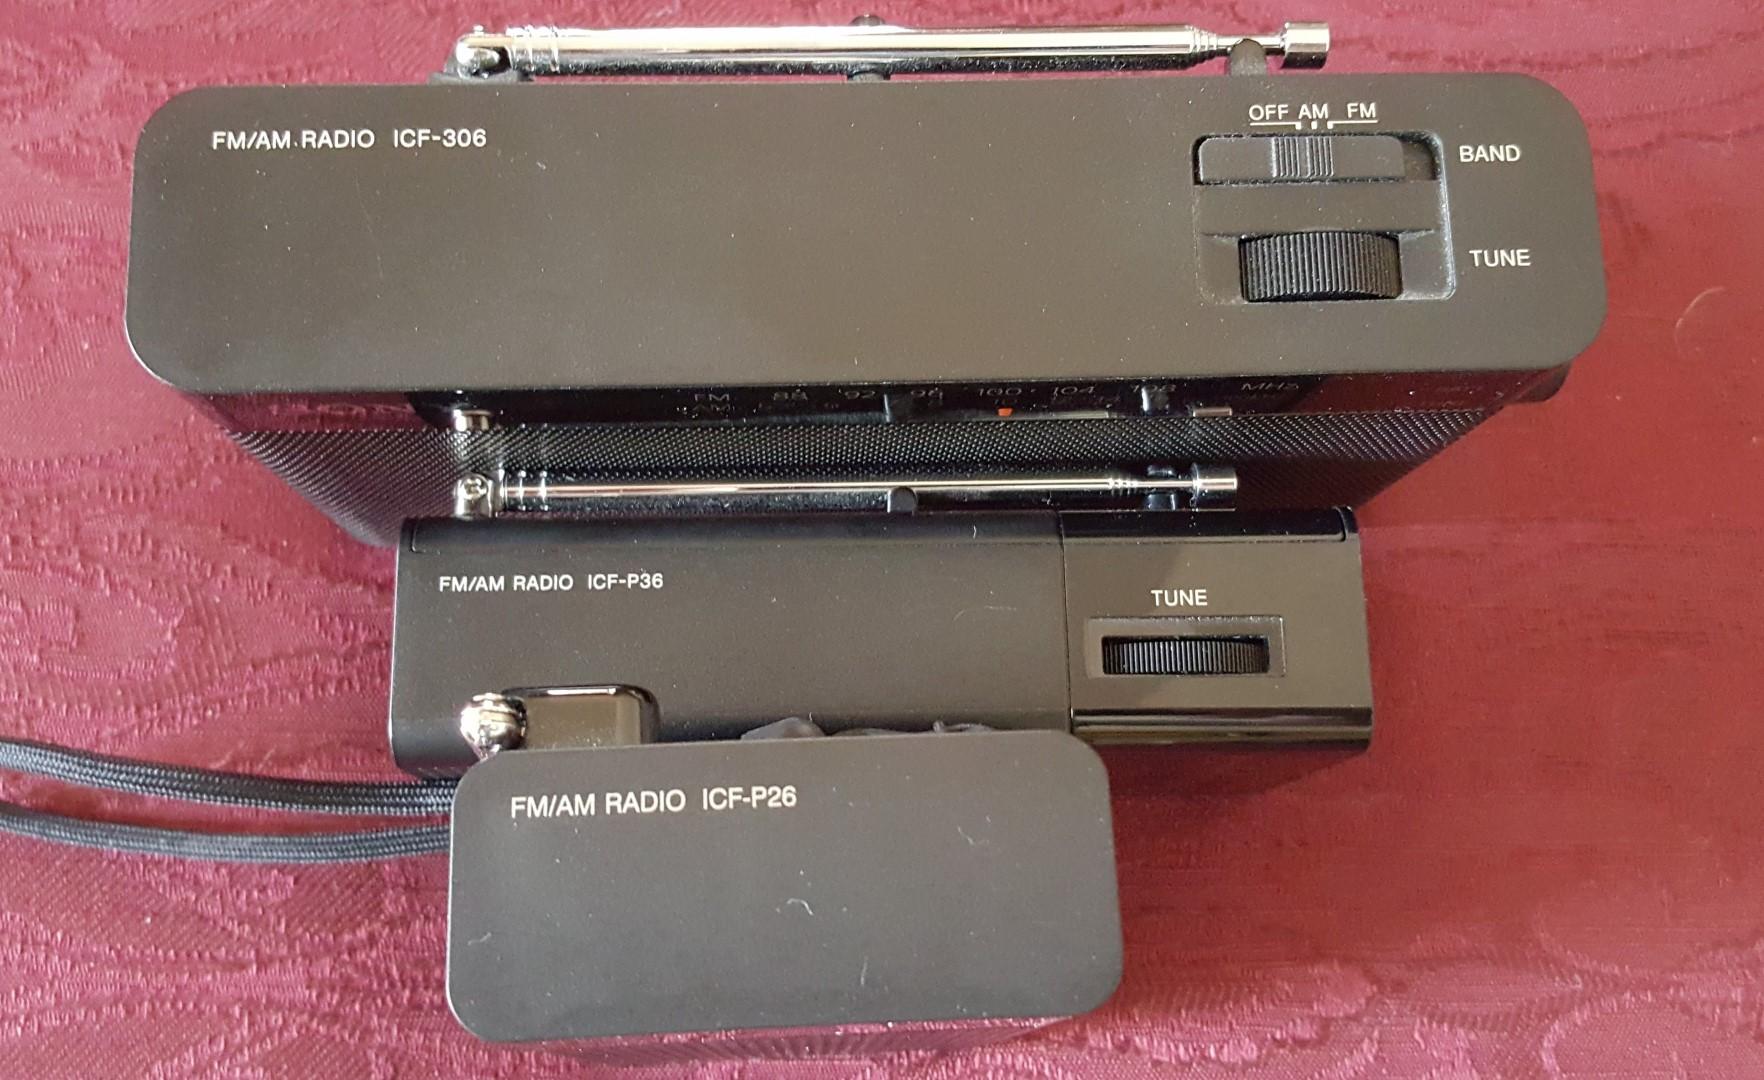 Sony ICF-P26 – ICF-P36 – ICF-306 AM/FM Portables   radiojayallen